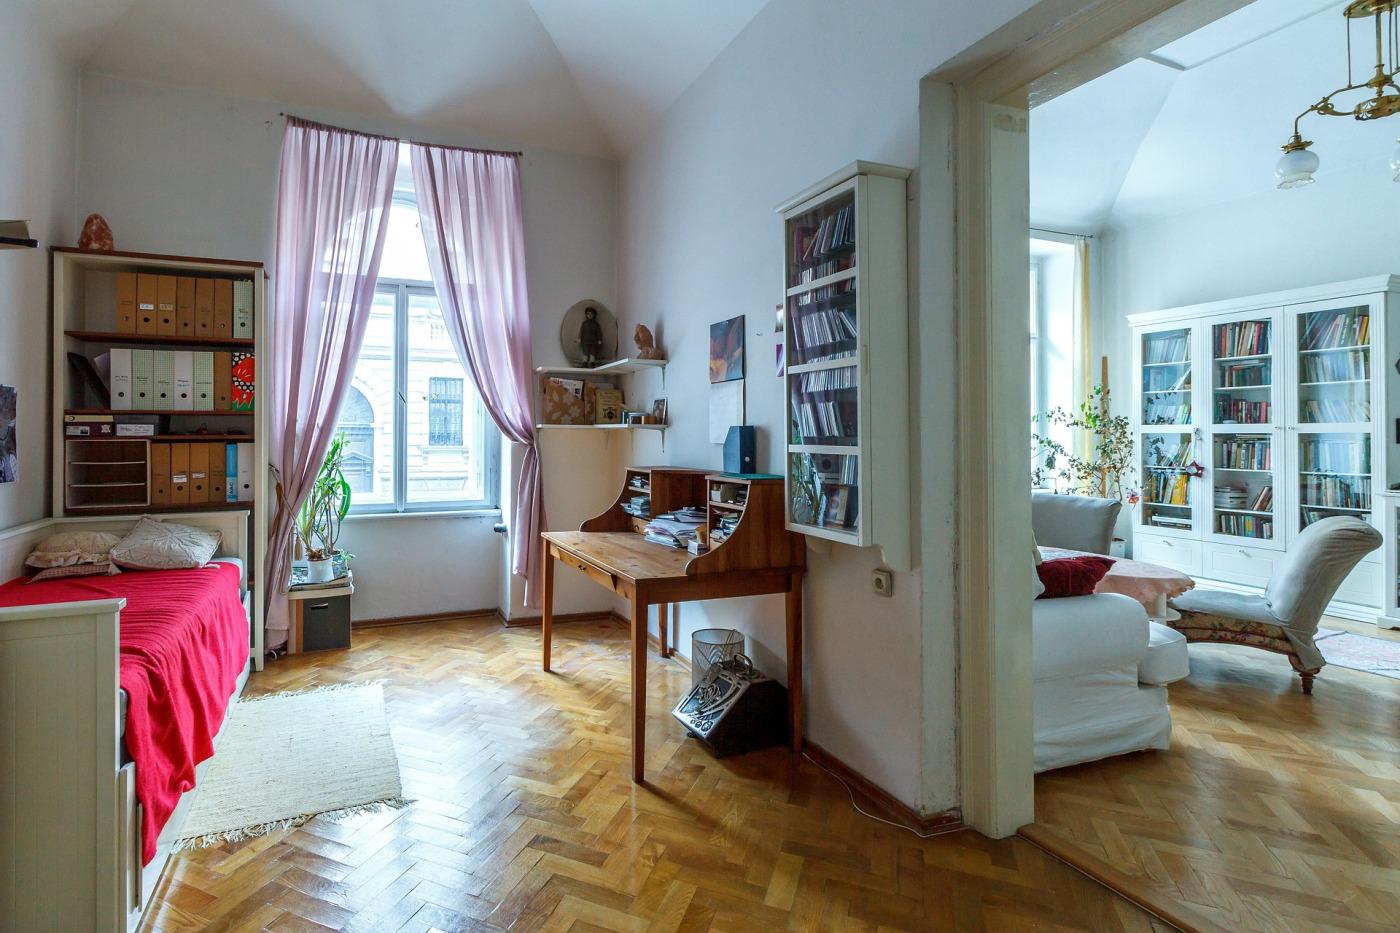 реконструкция квартиры киев, реставрация квартир